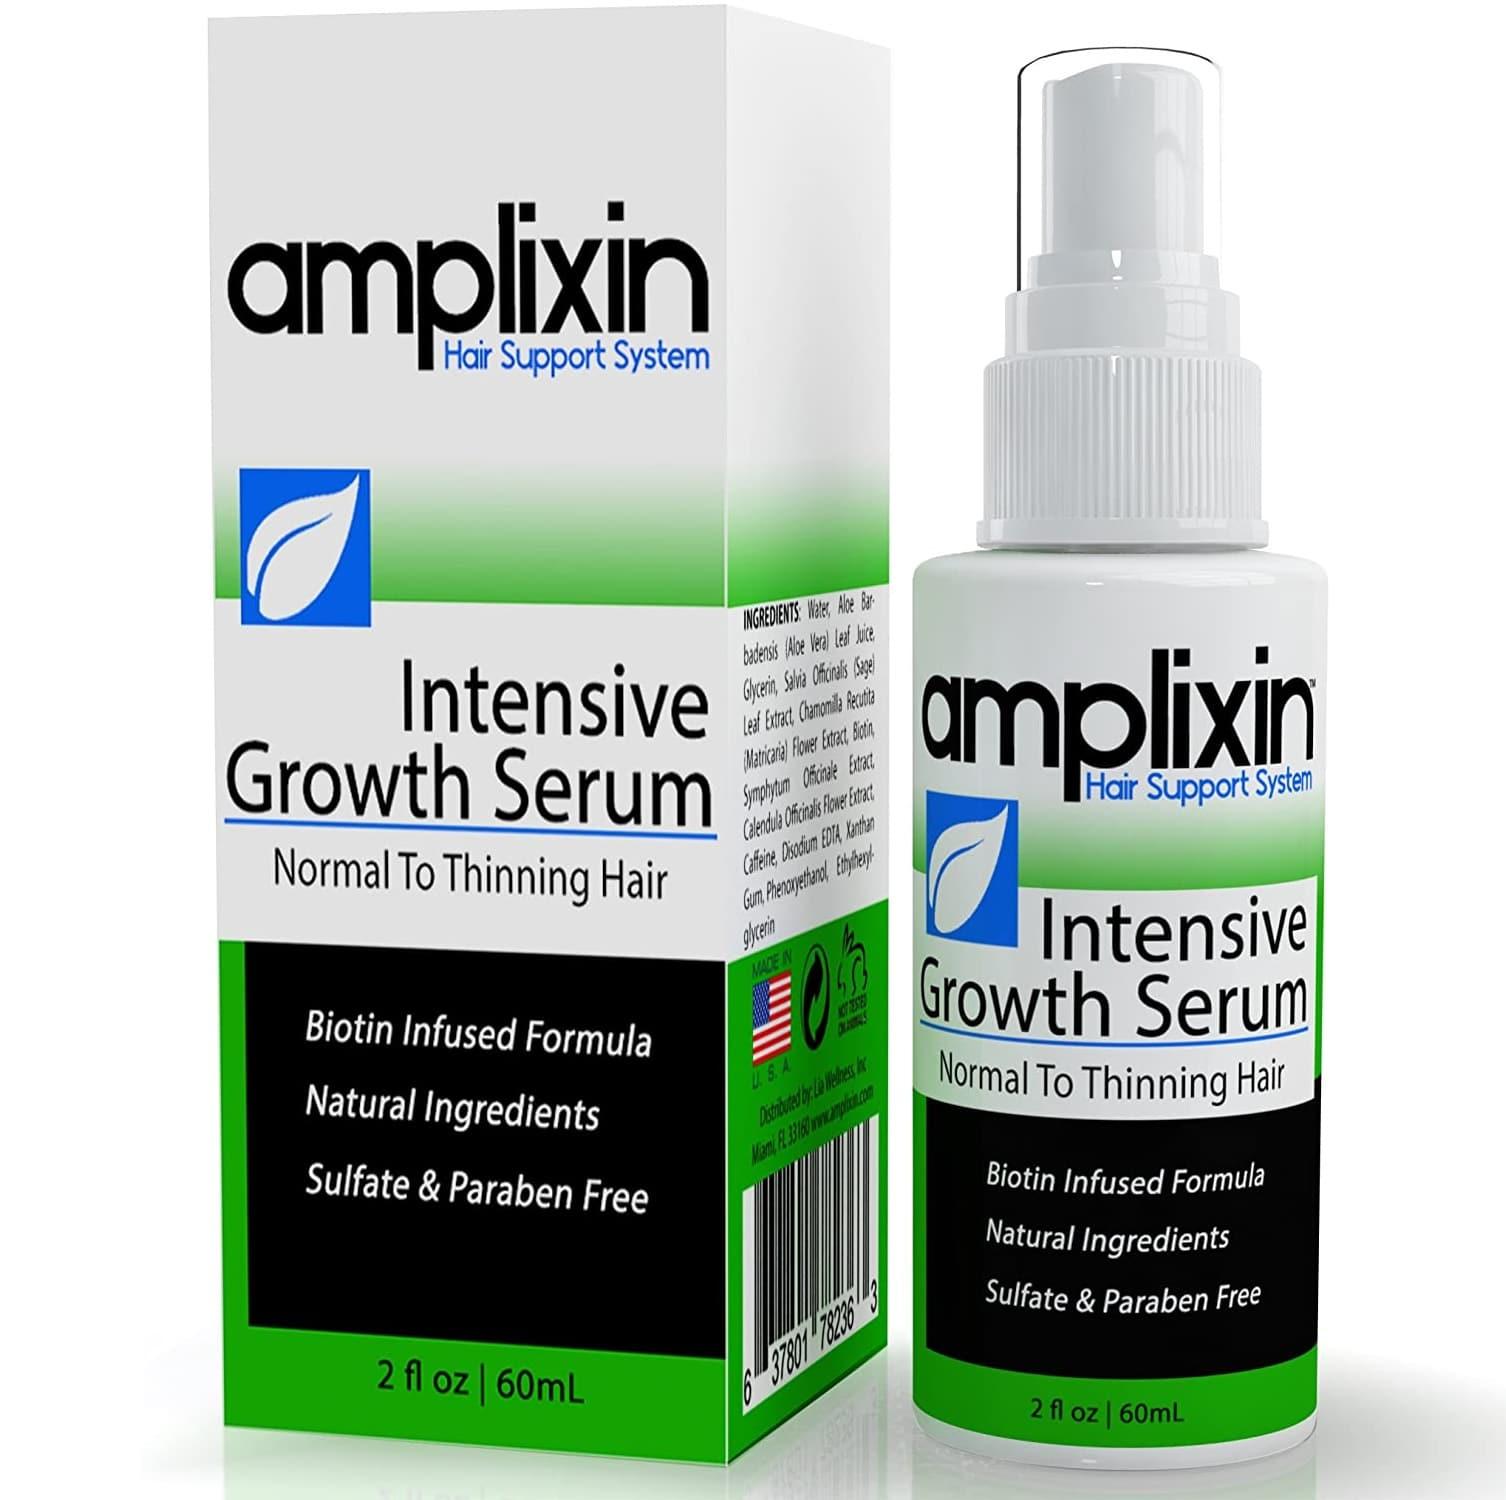 Best Hair Loss Treatment for Men - Amplixin review